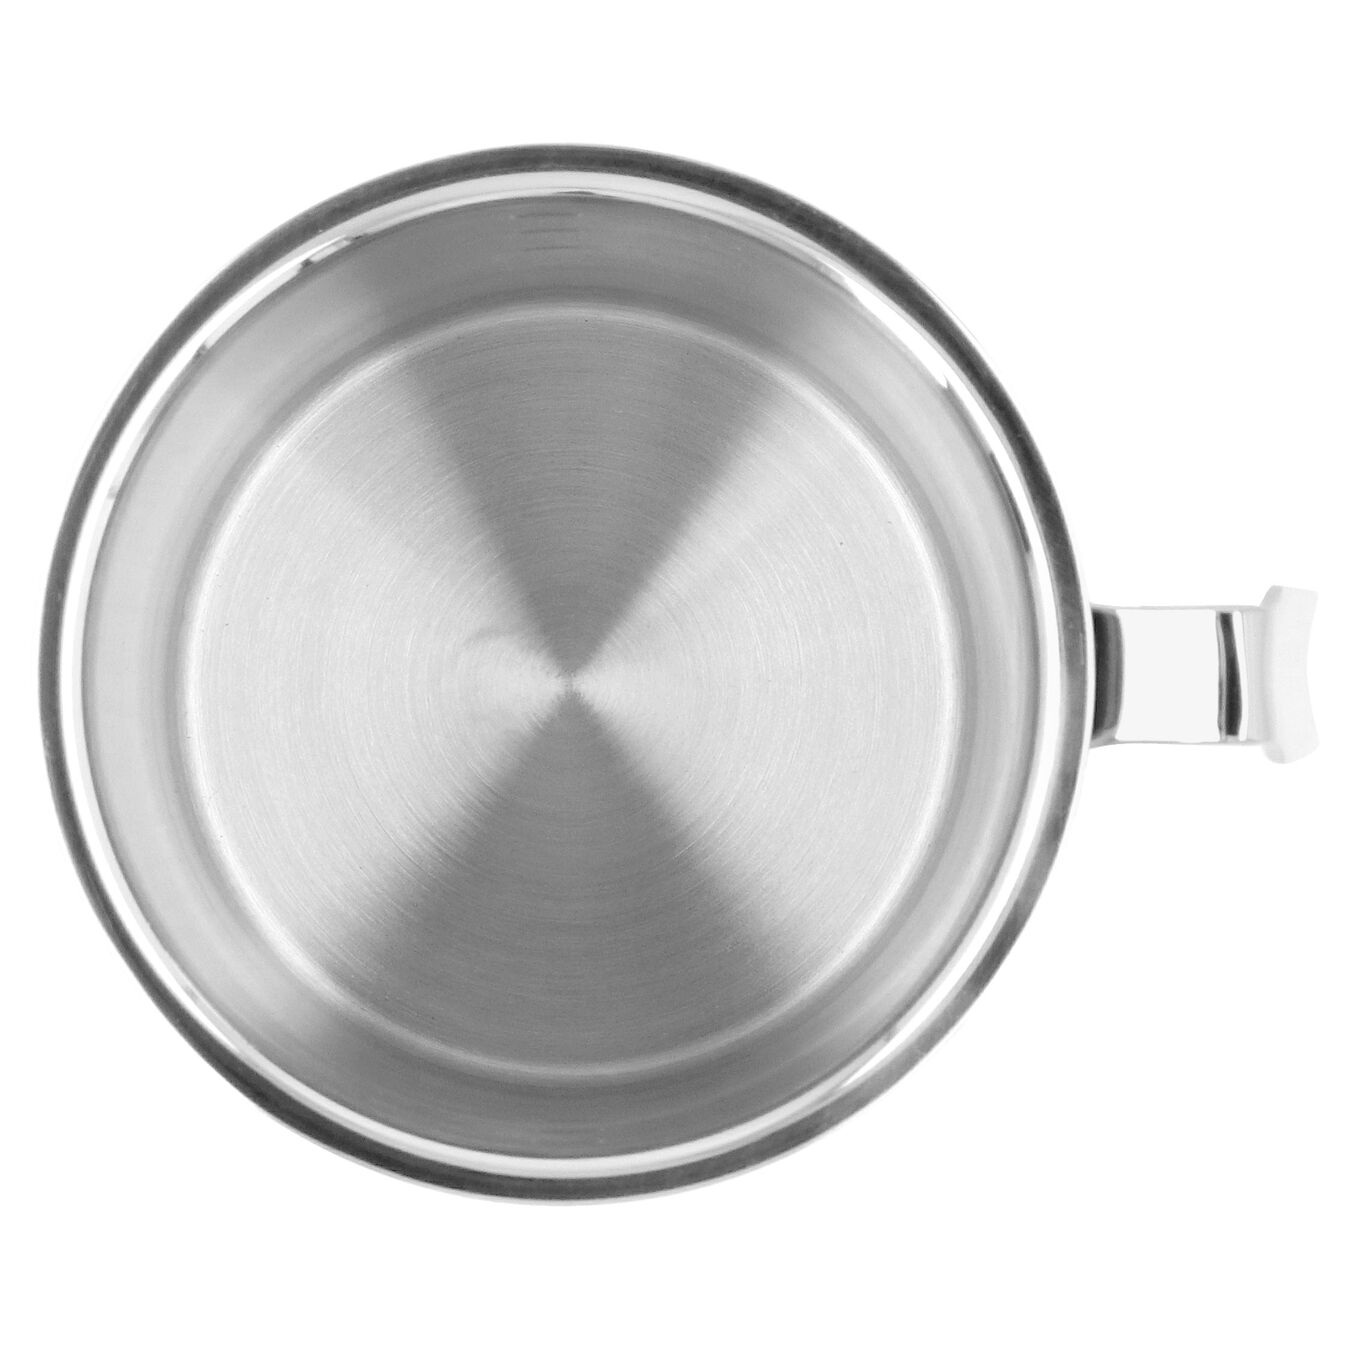 Kasserolle 10 cm, 18/10 rustfrit stål,,large 4